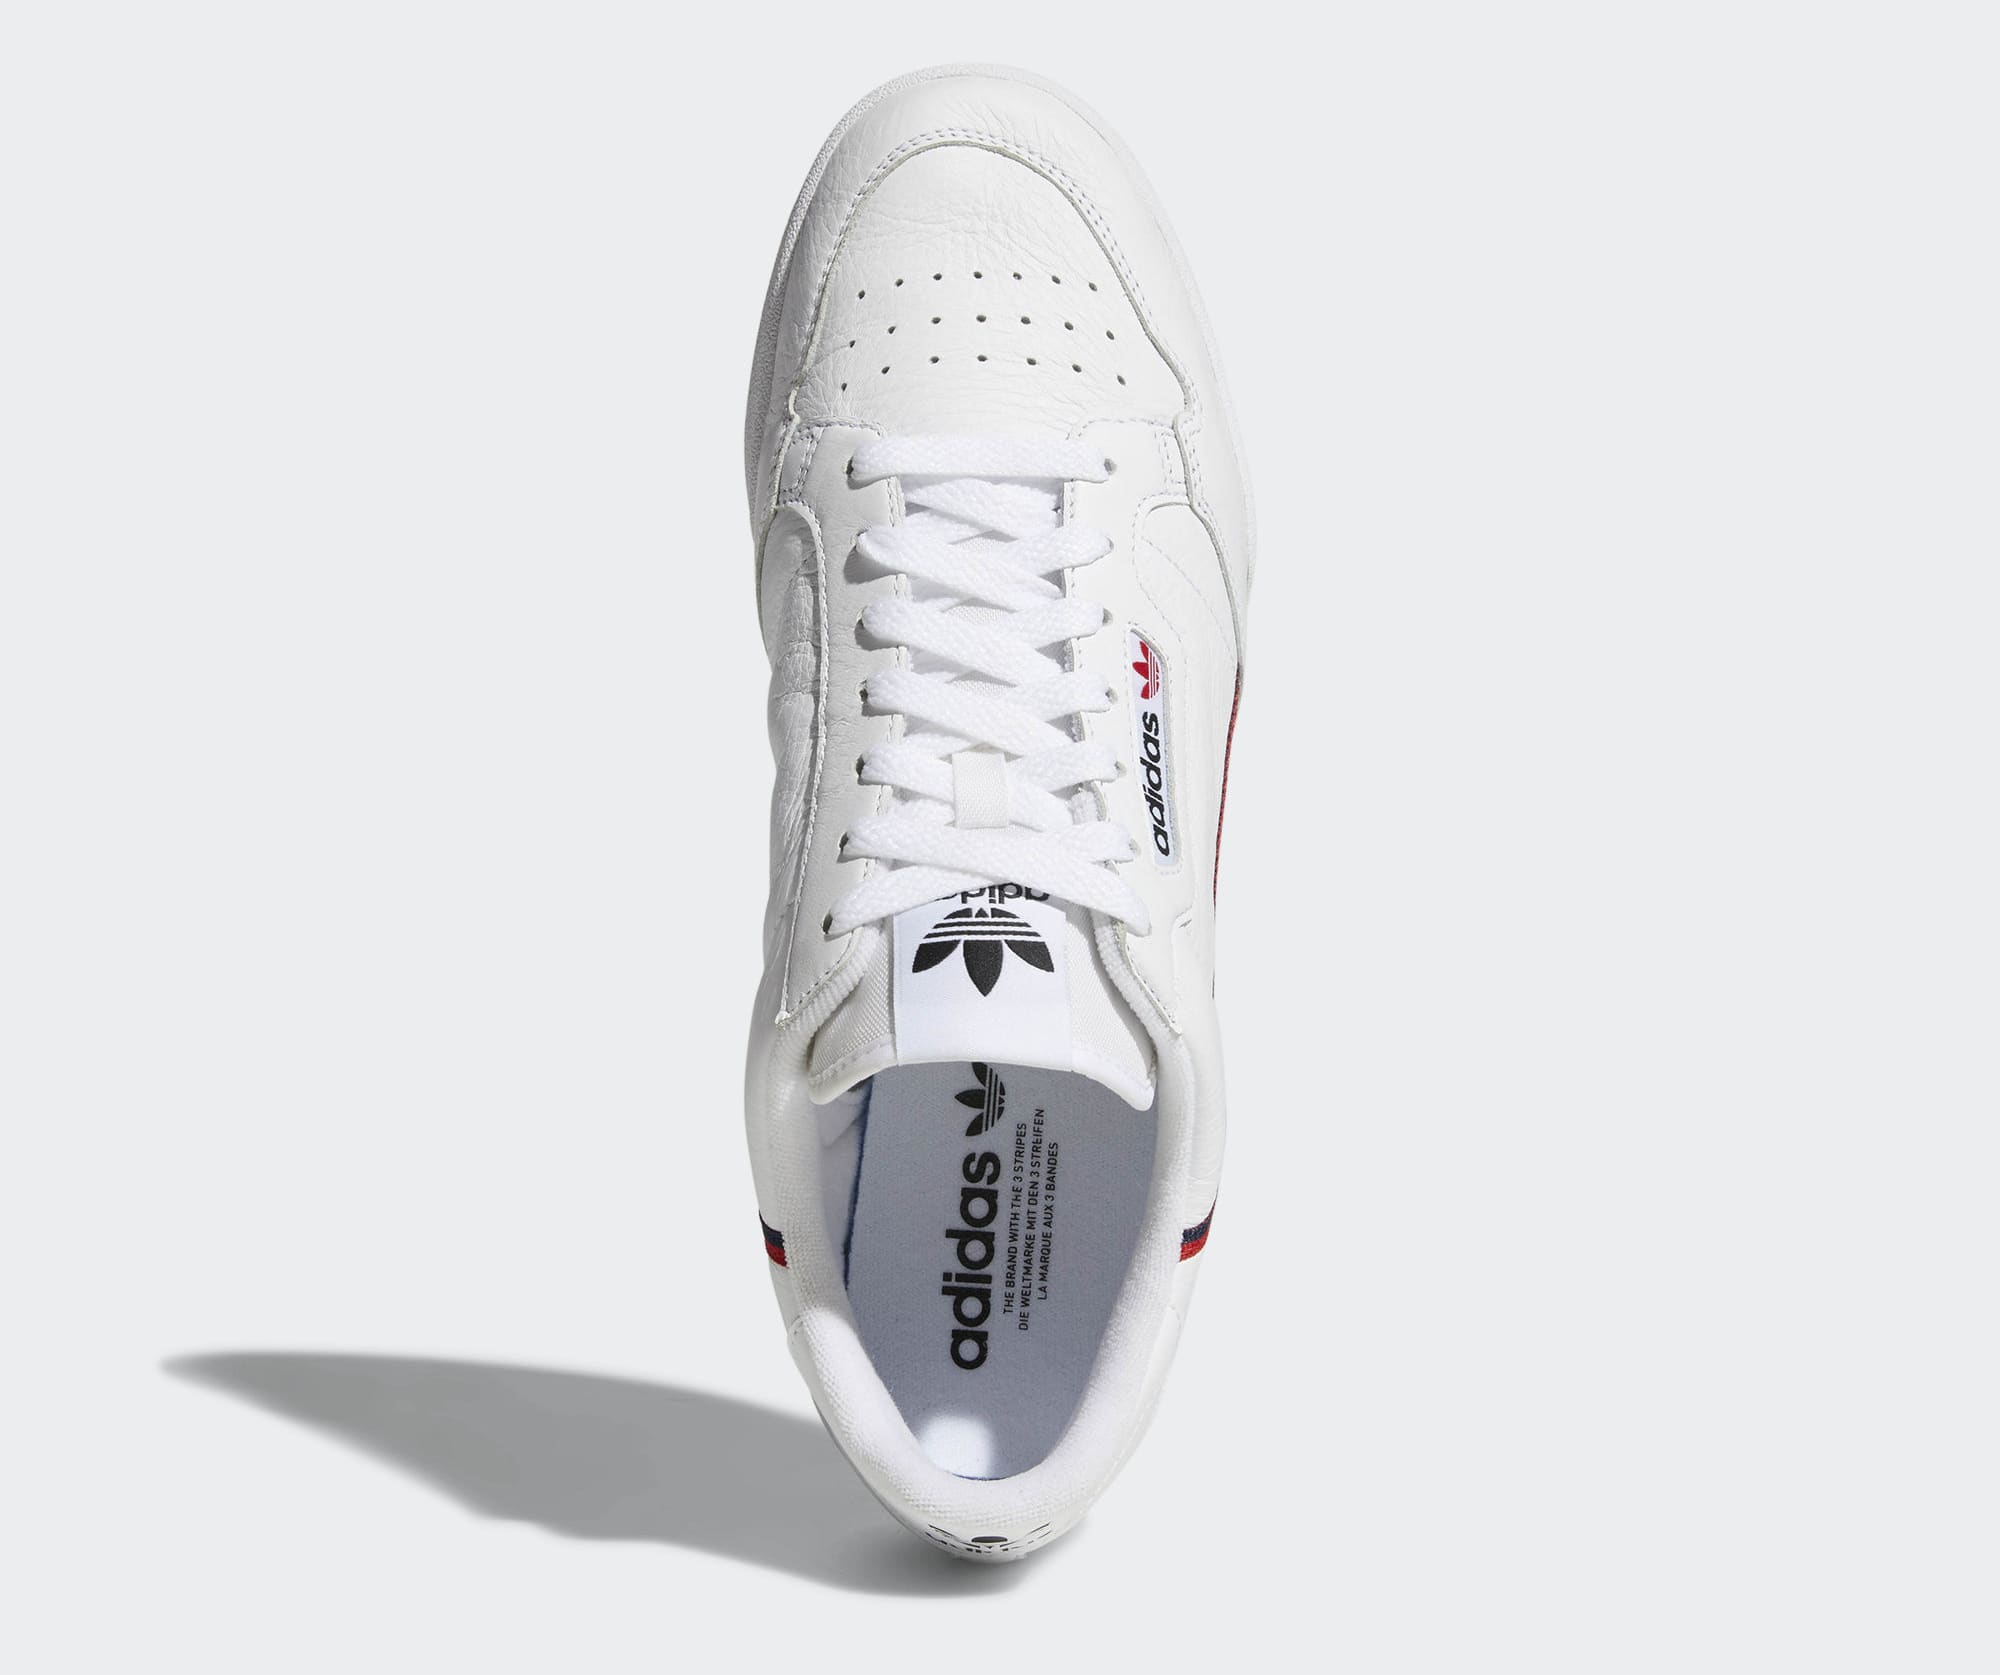 Adidas Continental 80 Rascal B41674 (Top)